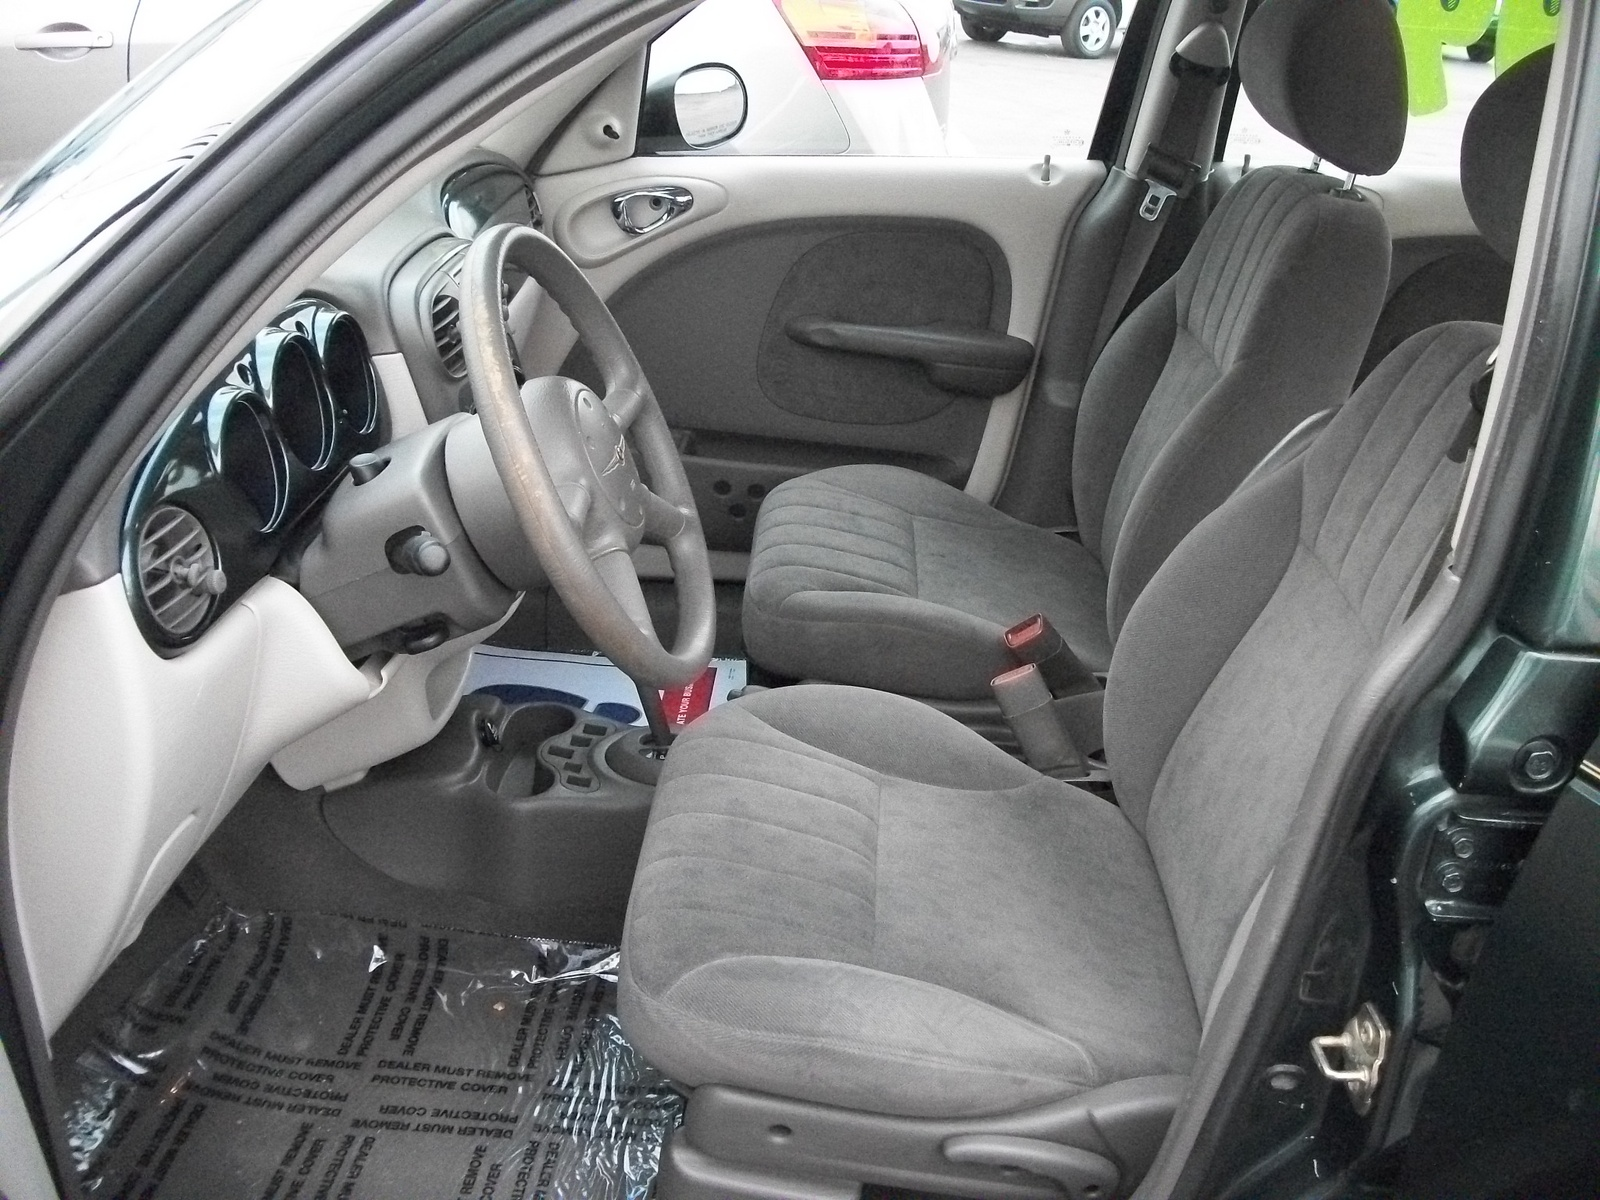 2001 chrysler pt cruiser interior pictures cargurus. Black Bedroom Furniture Sets. Home Design Ideas